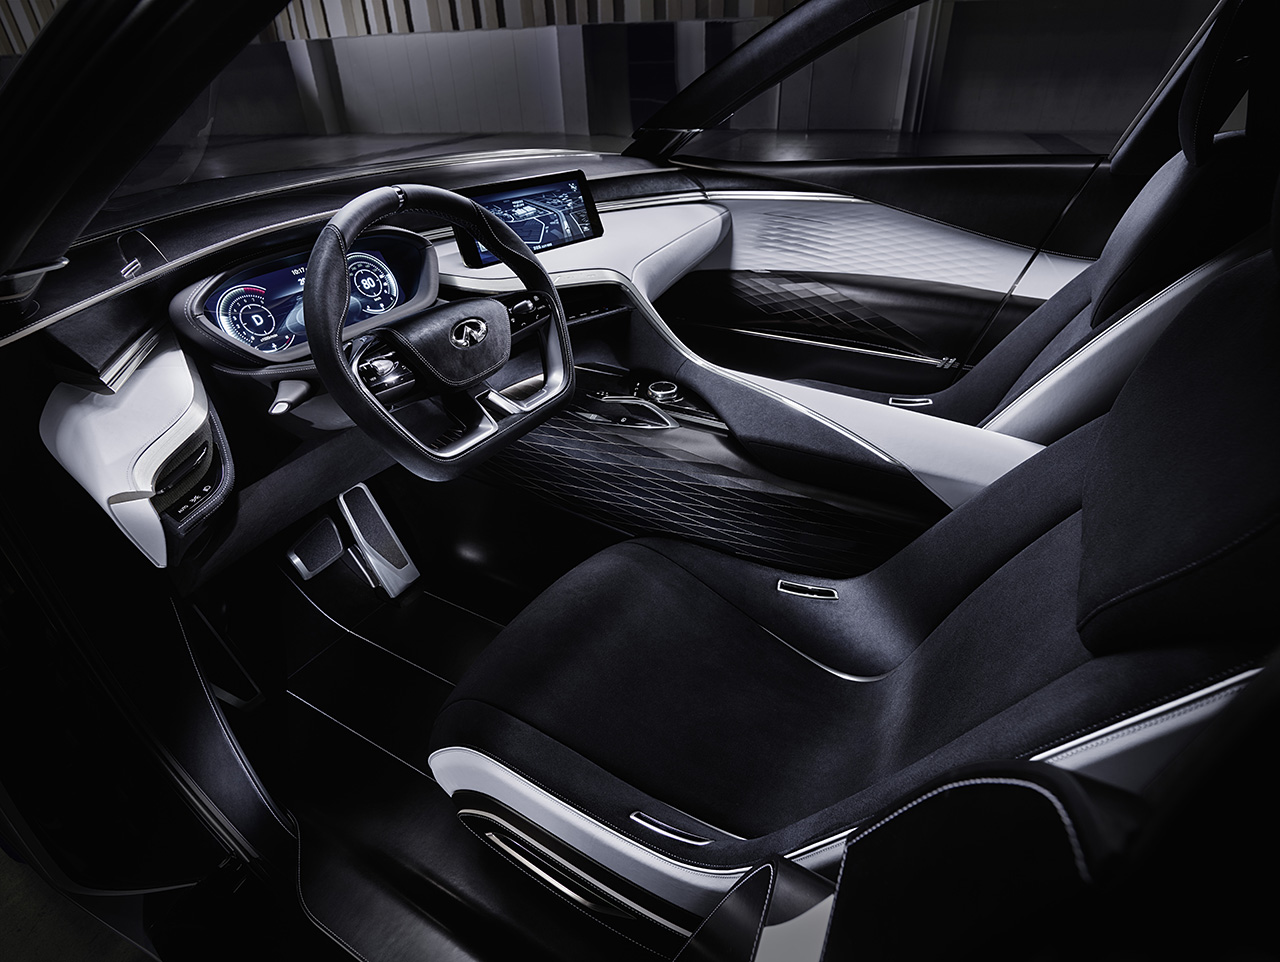 2016 Beijing Preview - Infiniti QX Sport Inspiration Concept